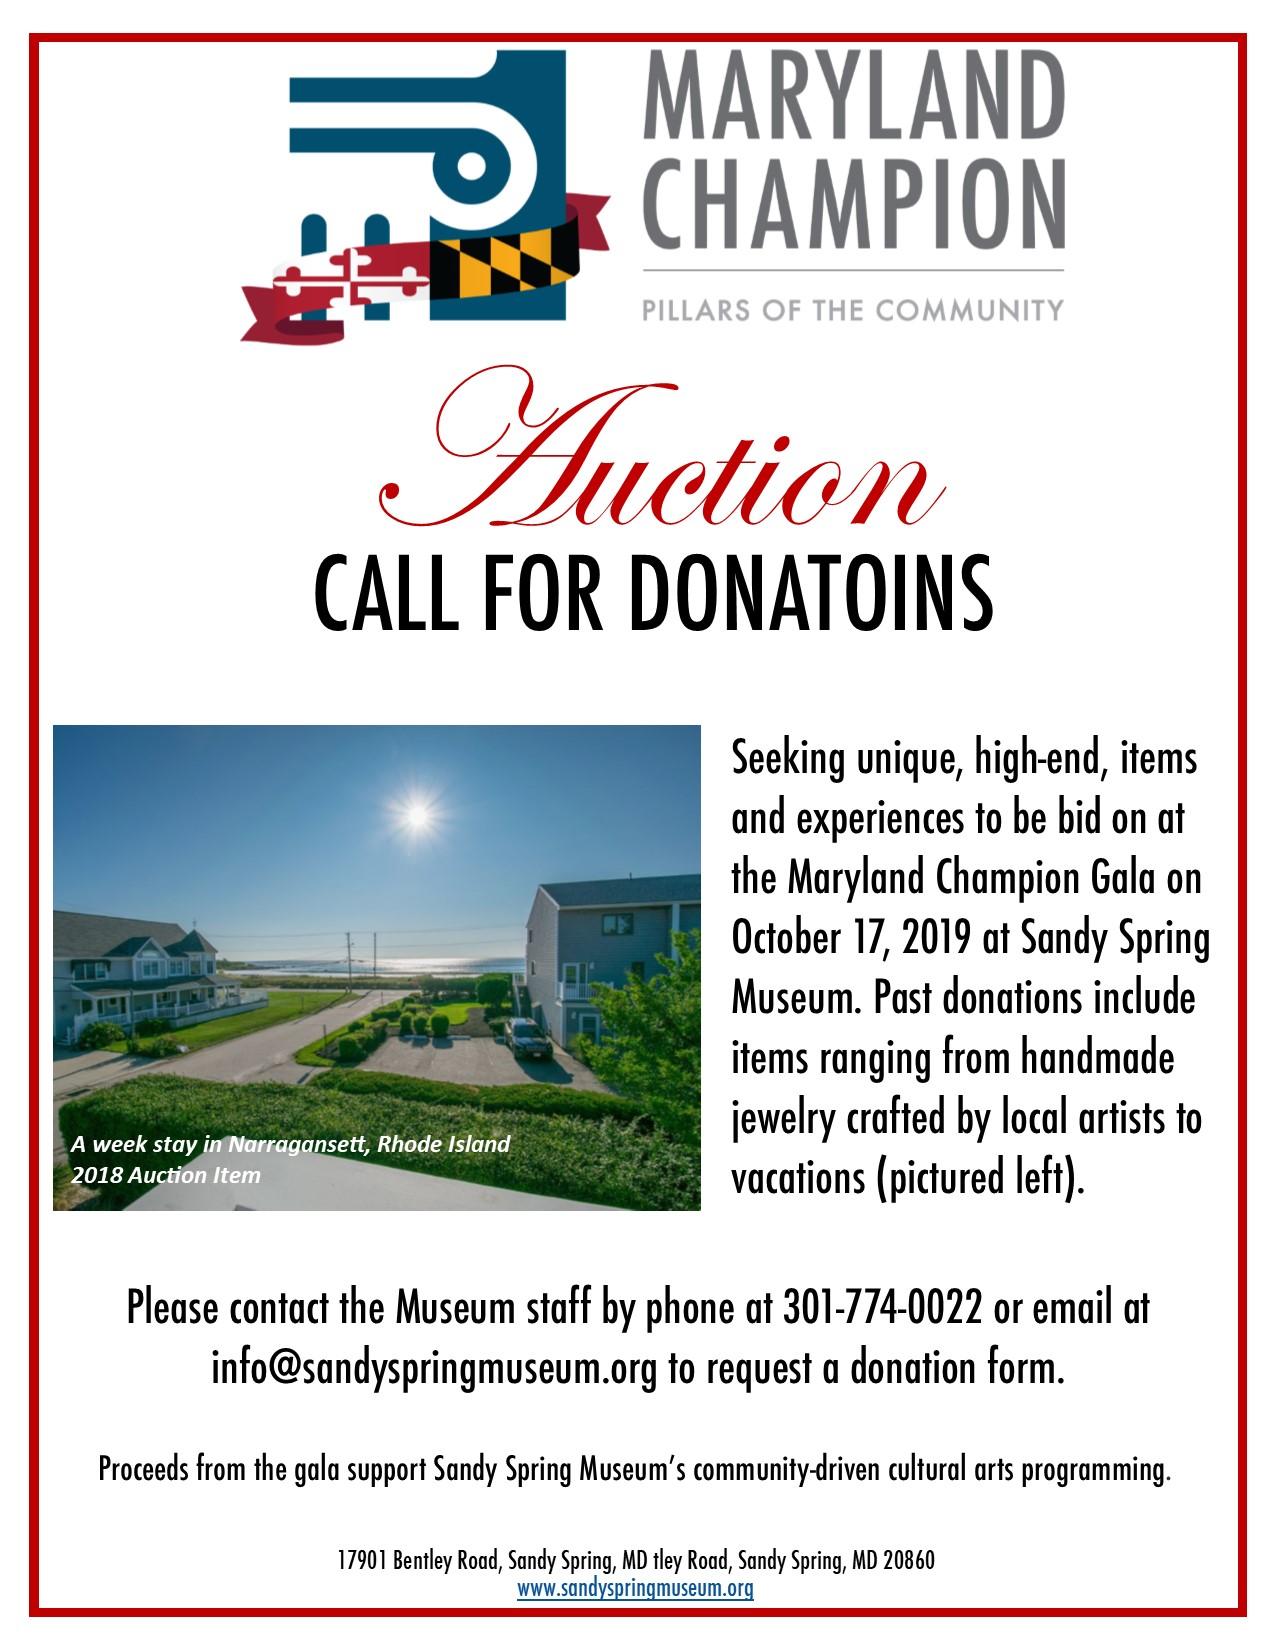 2019 Maryland Champion Gala auction donation solicitation flyer